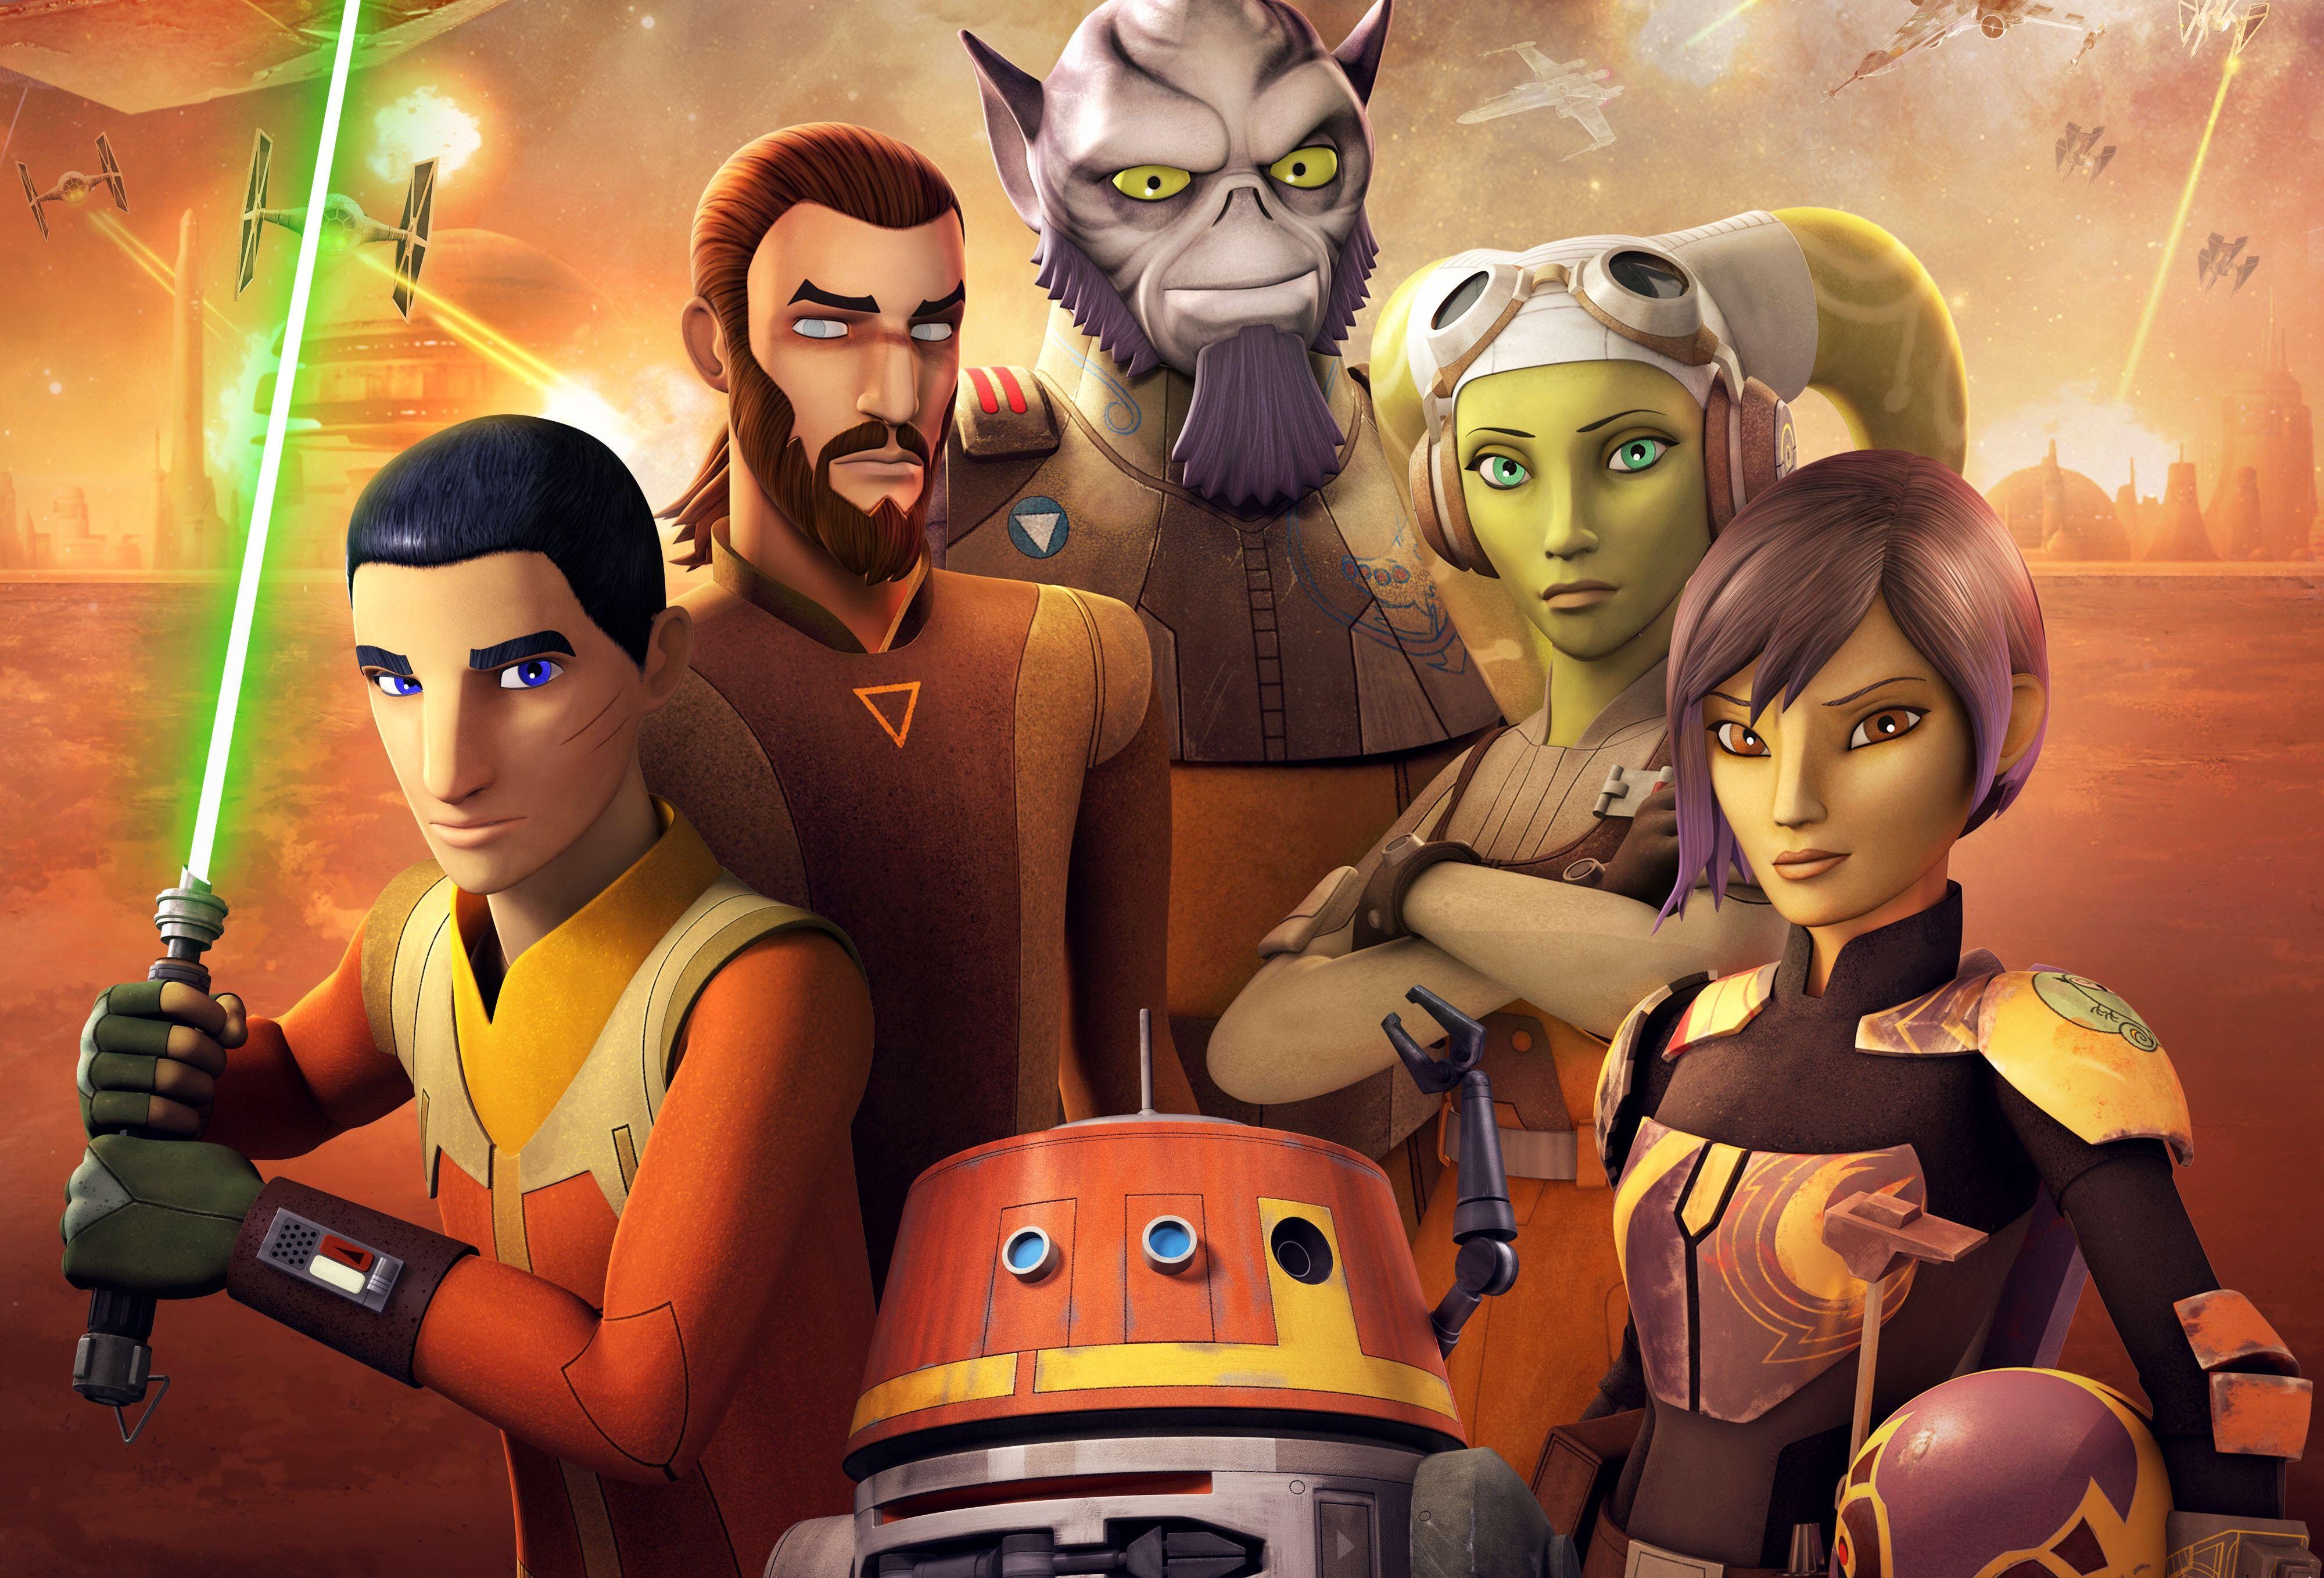 Star Wars Rebels 4k Ultra Hd Wallpaper Background Image